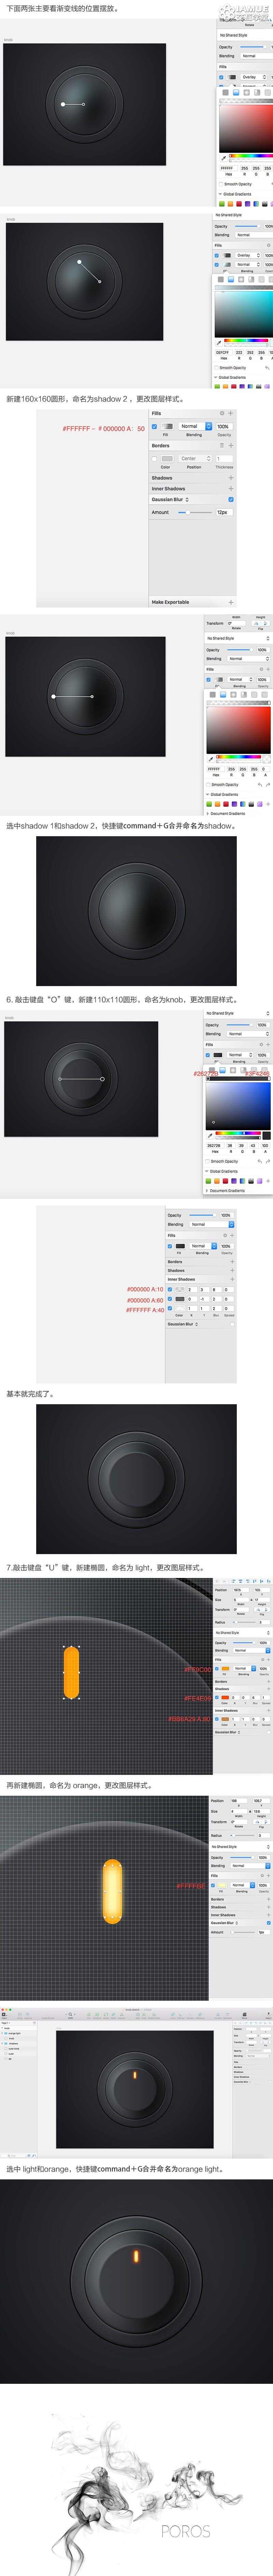 sktch打造knob开关icon